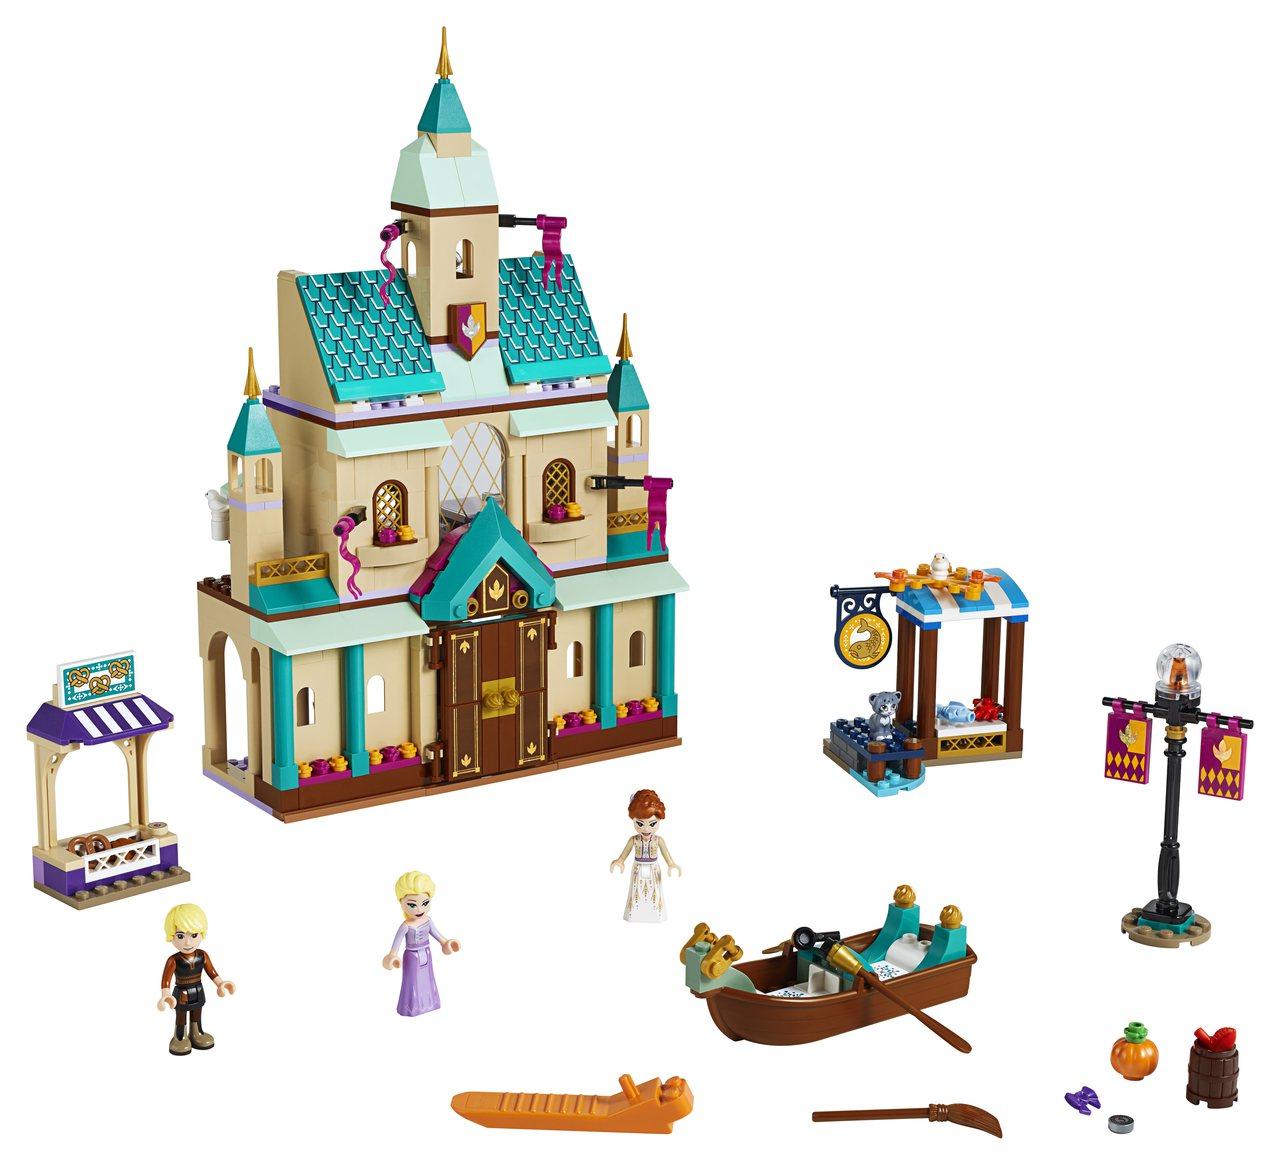 LEGO樂高《冰雪奇緣2》系列「艾倫戴爾王國城堡村」以3層樓重現電影場景細節,售...